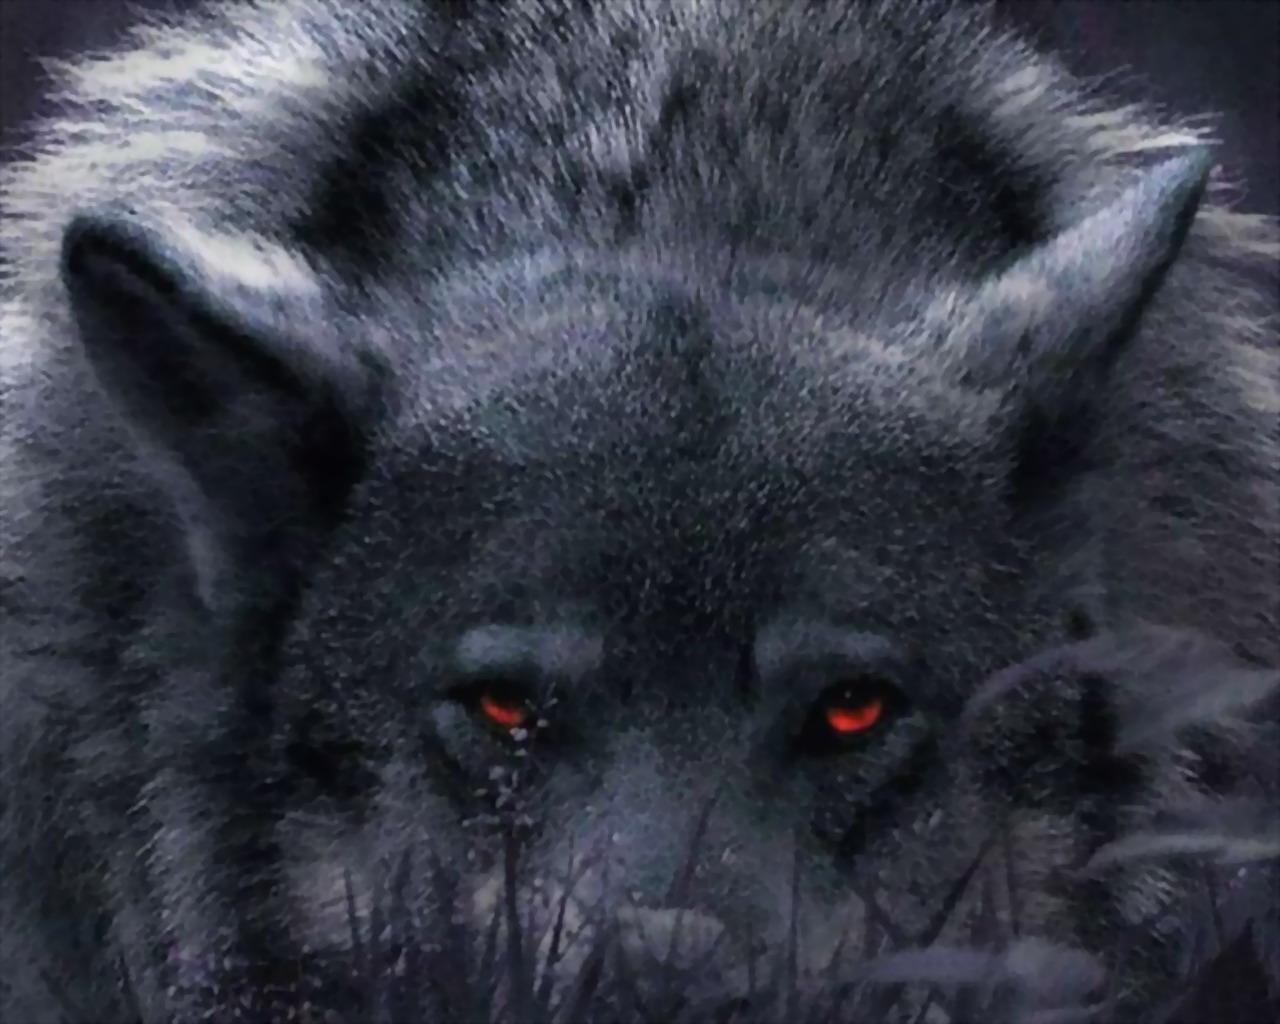 Wolf Wallpapers Hintergrnde 1280x1024 ID171733 1280x1024